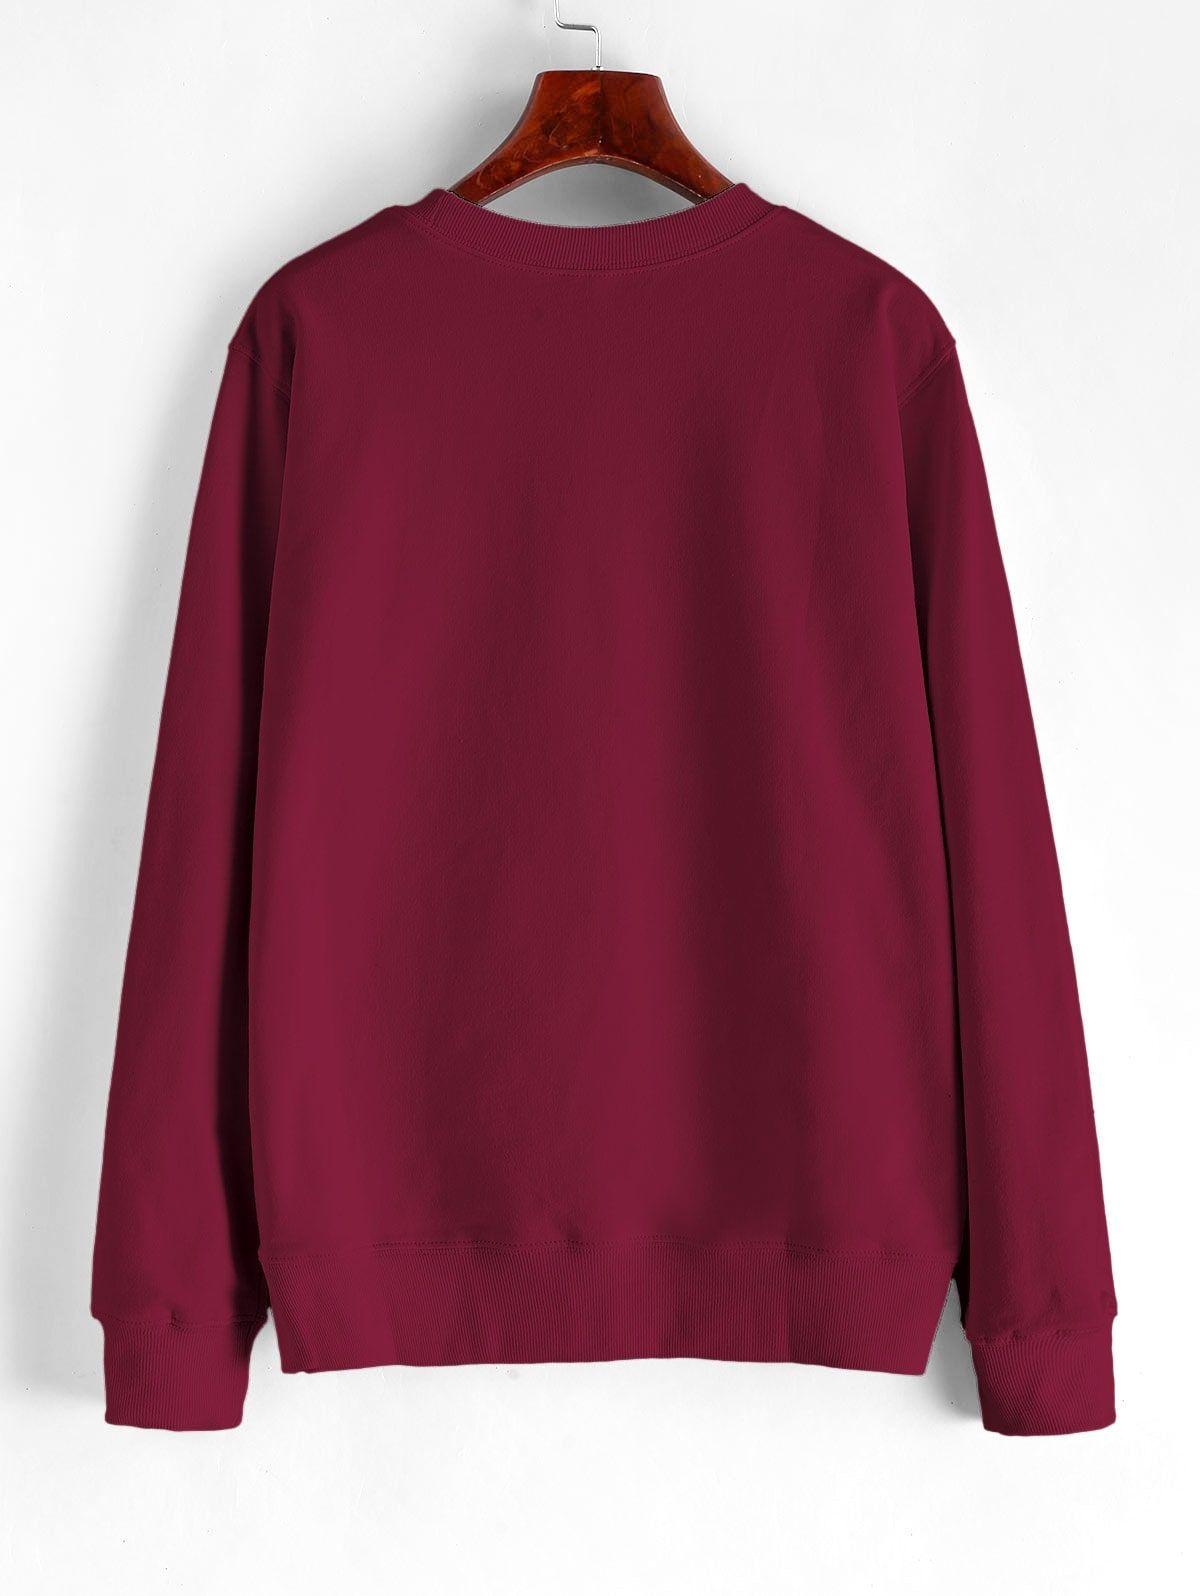 Hand Graphic French Terry Basic Sweatshirt Red Wine Affiliate French Terry Hand Graphic In 2020 Contrast Sweatshirt Faux Fur Sweatshirt Sweatshirt Fashion